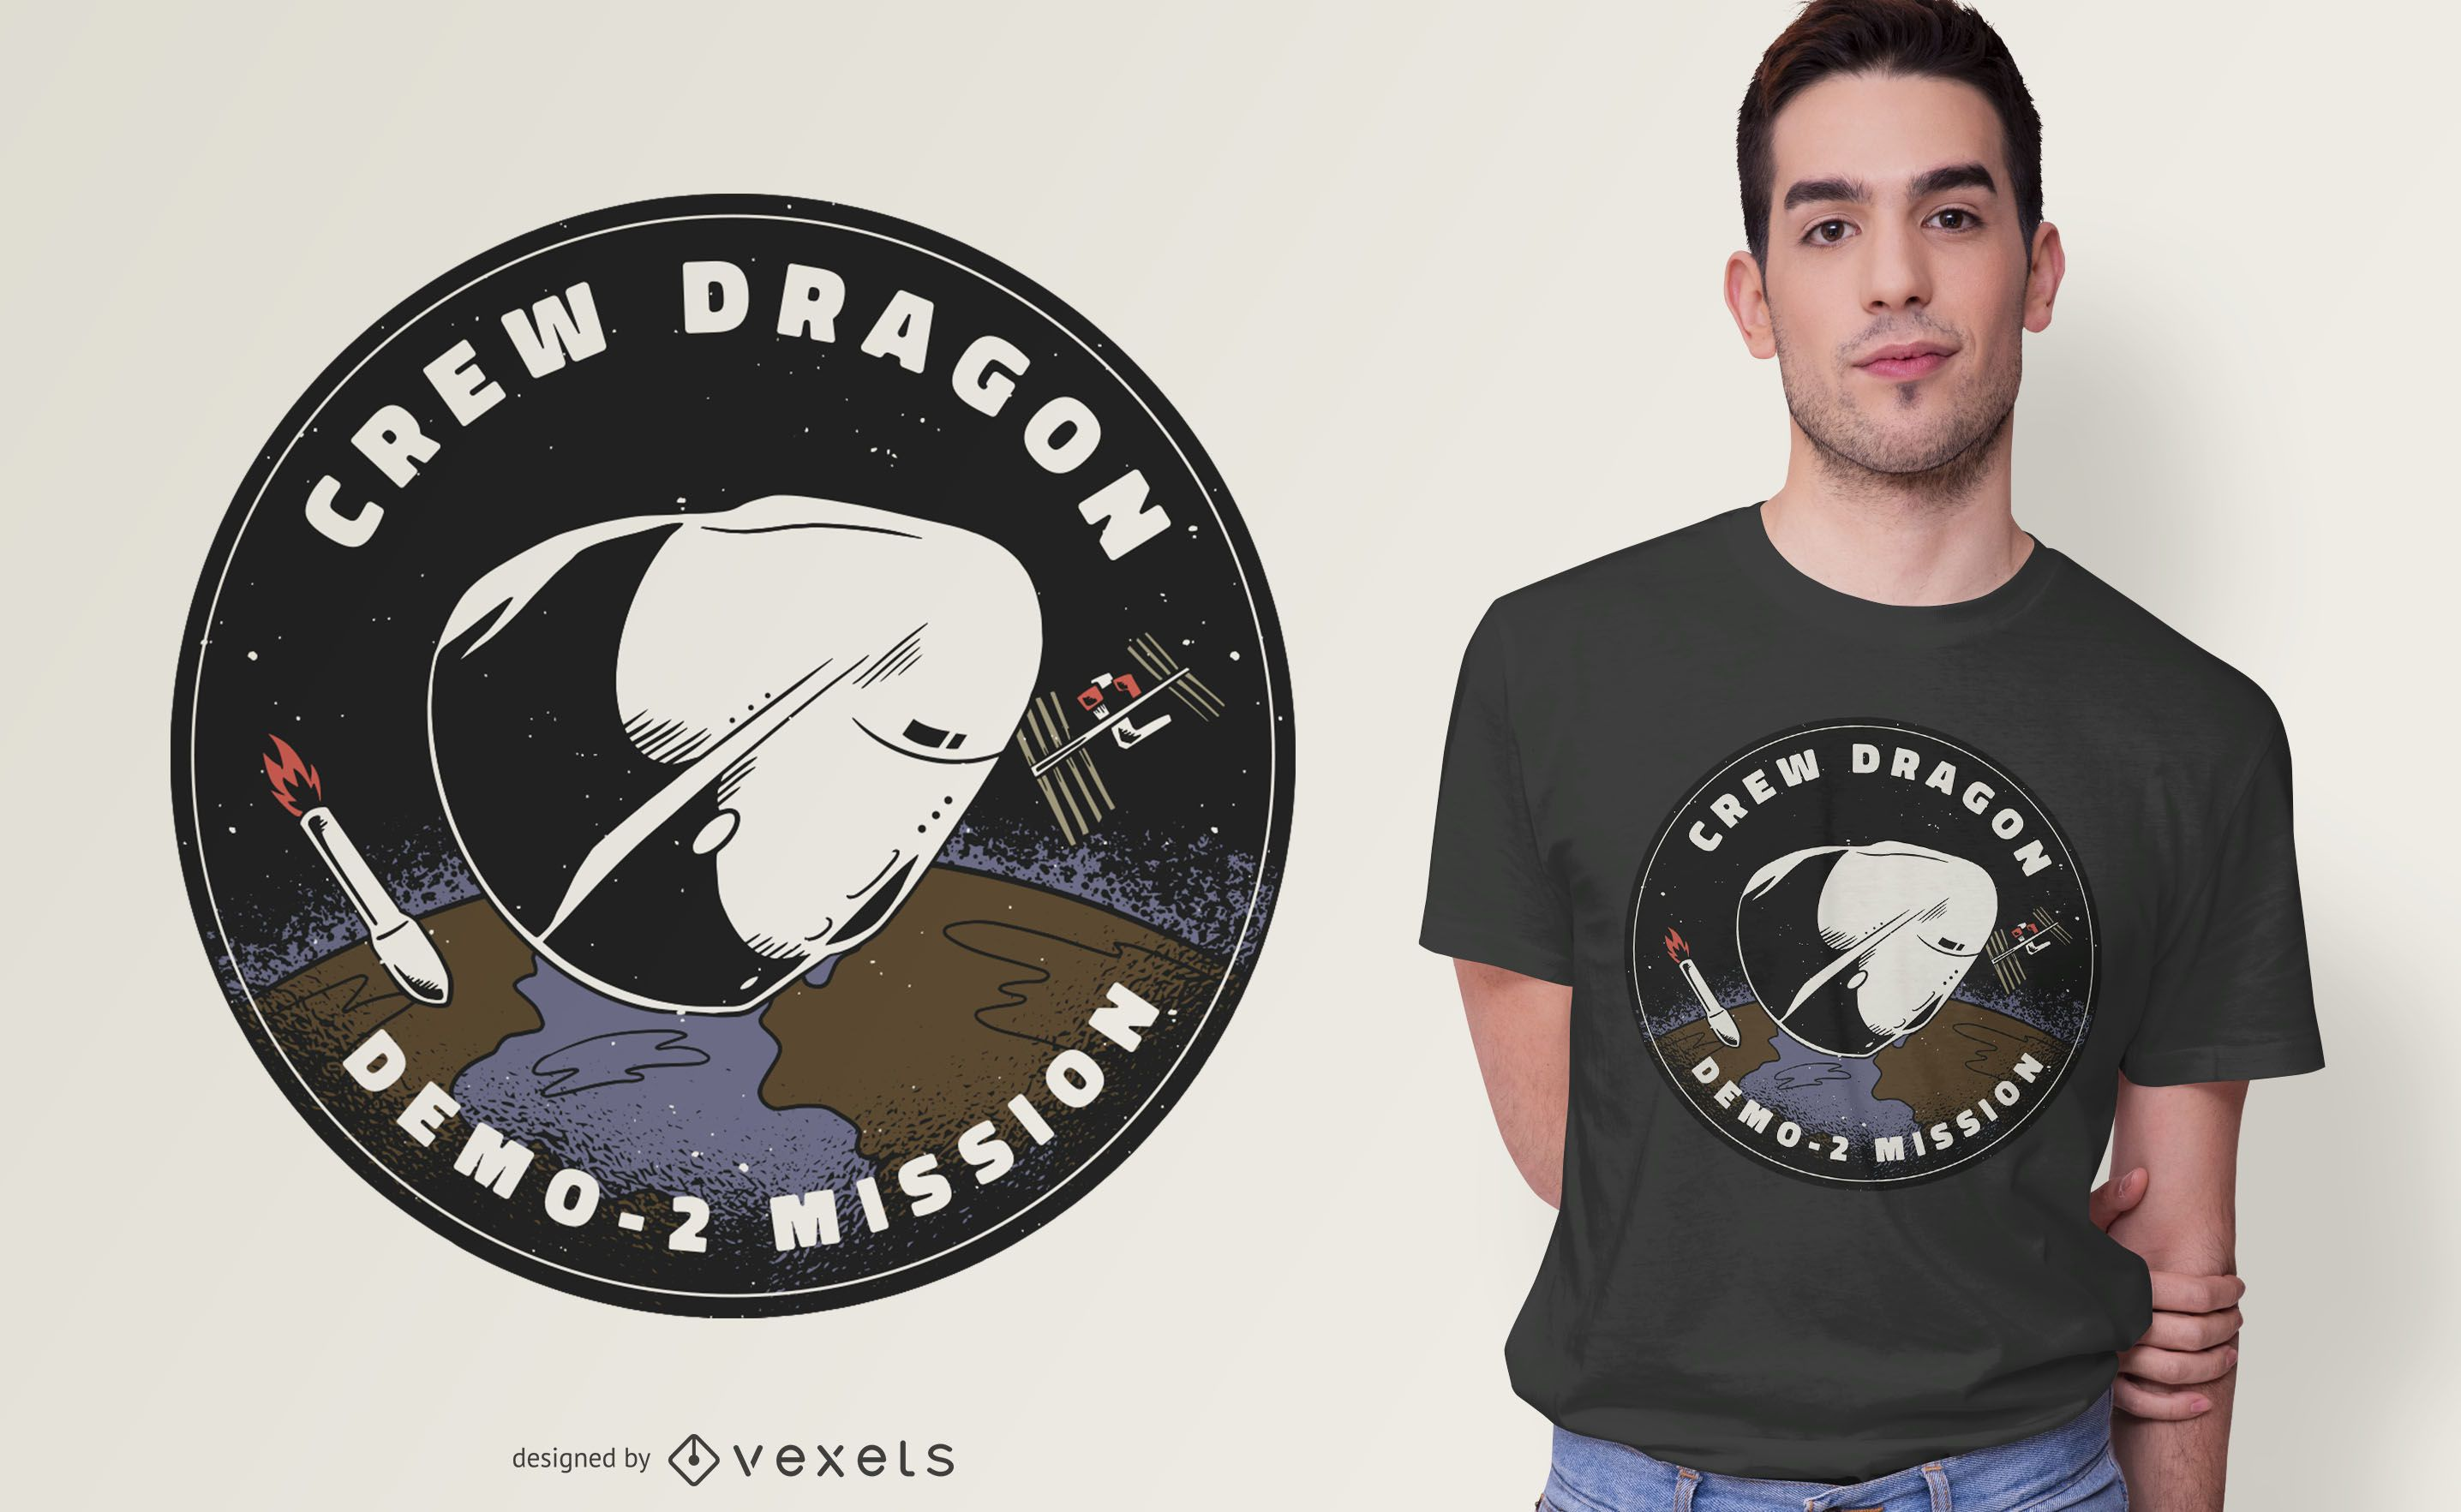 Diseño de camiseta Crew Dragon Patch